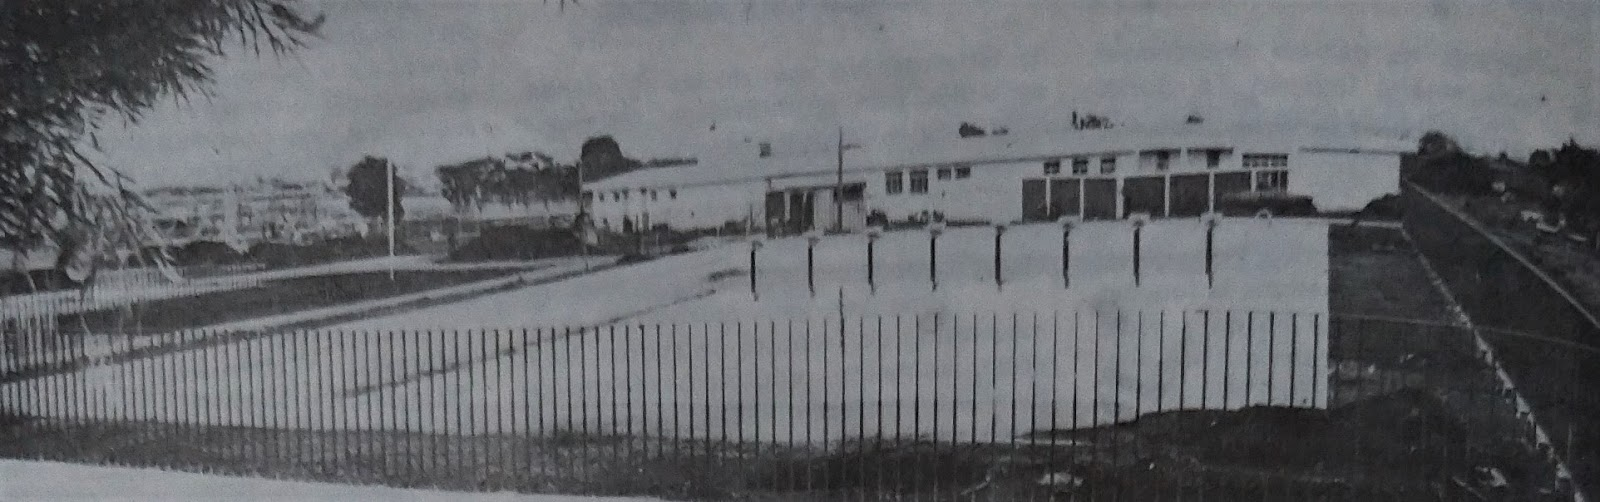 Centro Social Urbano Dep. Rivadávia Vargas - 1980